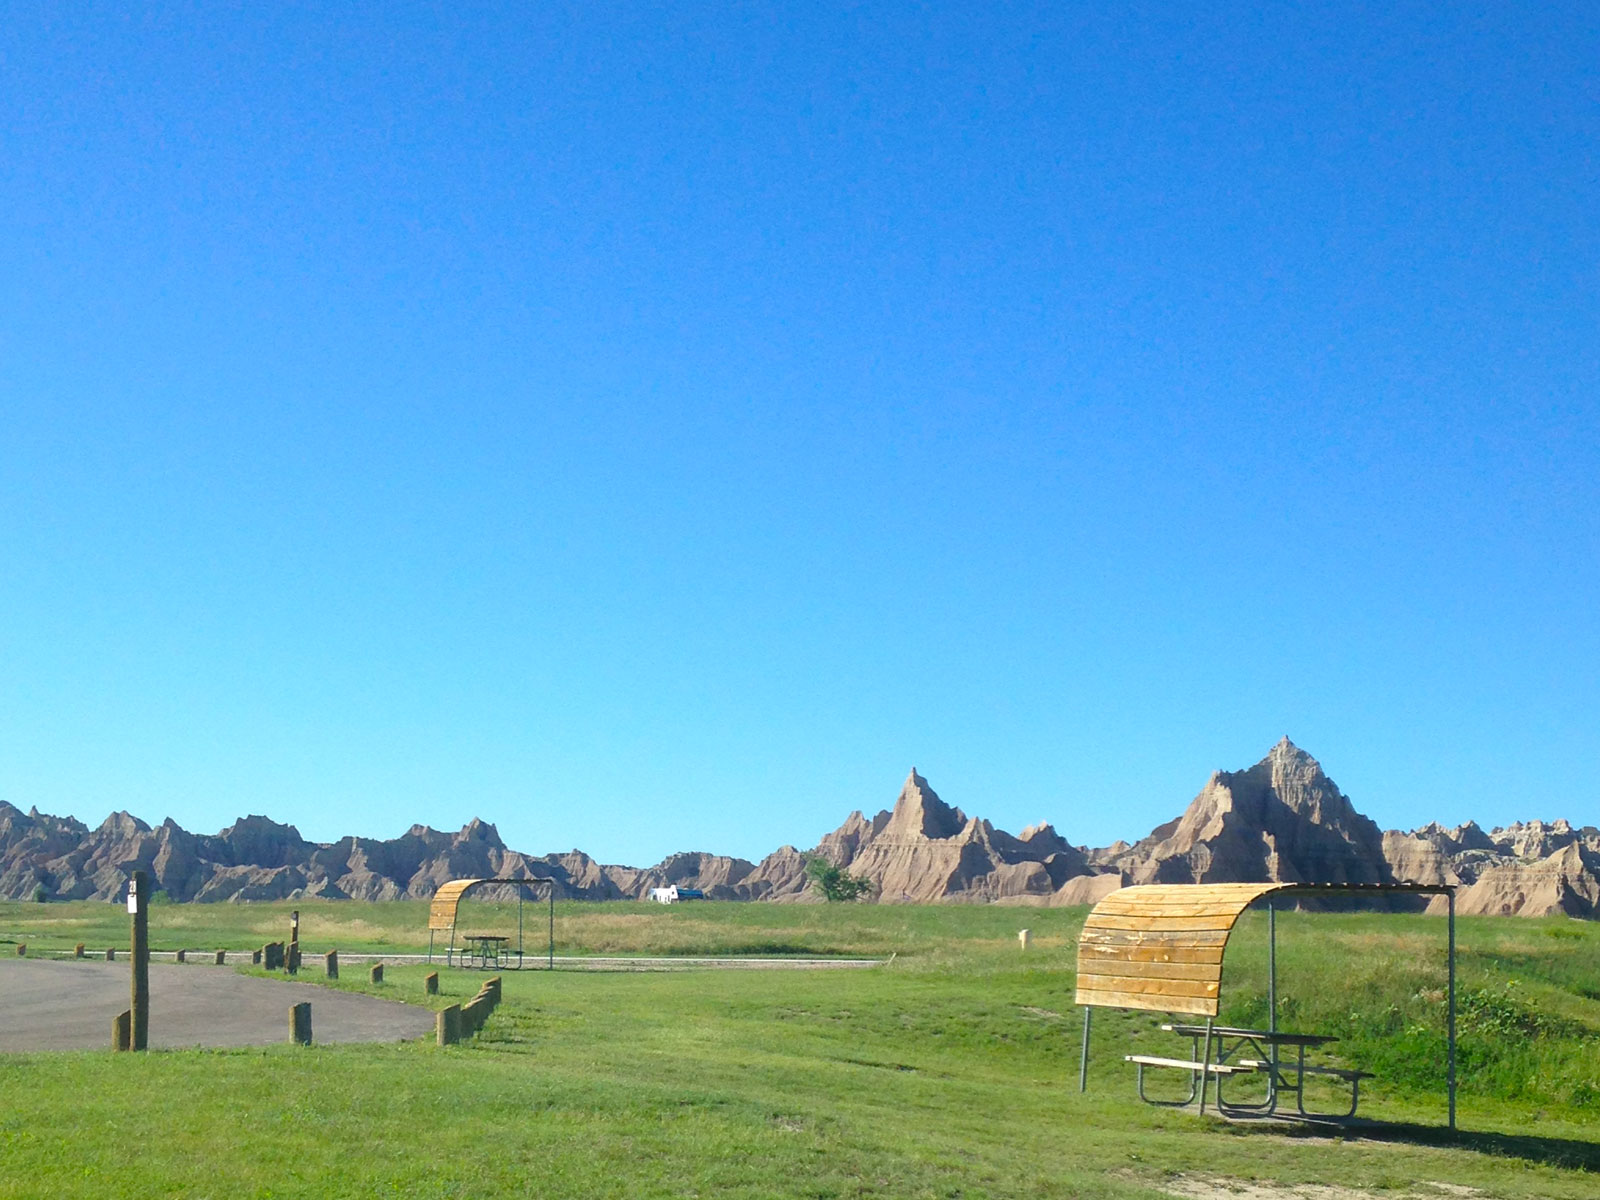 Campsites at Cedar Pass Campground in the Badlands National Park of South Dakota